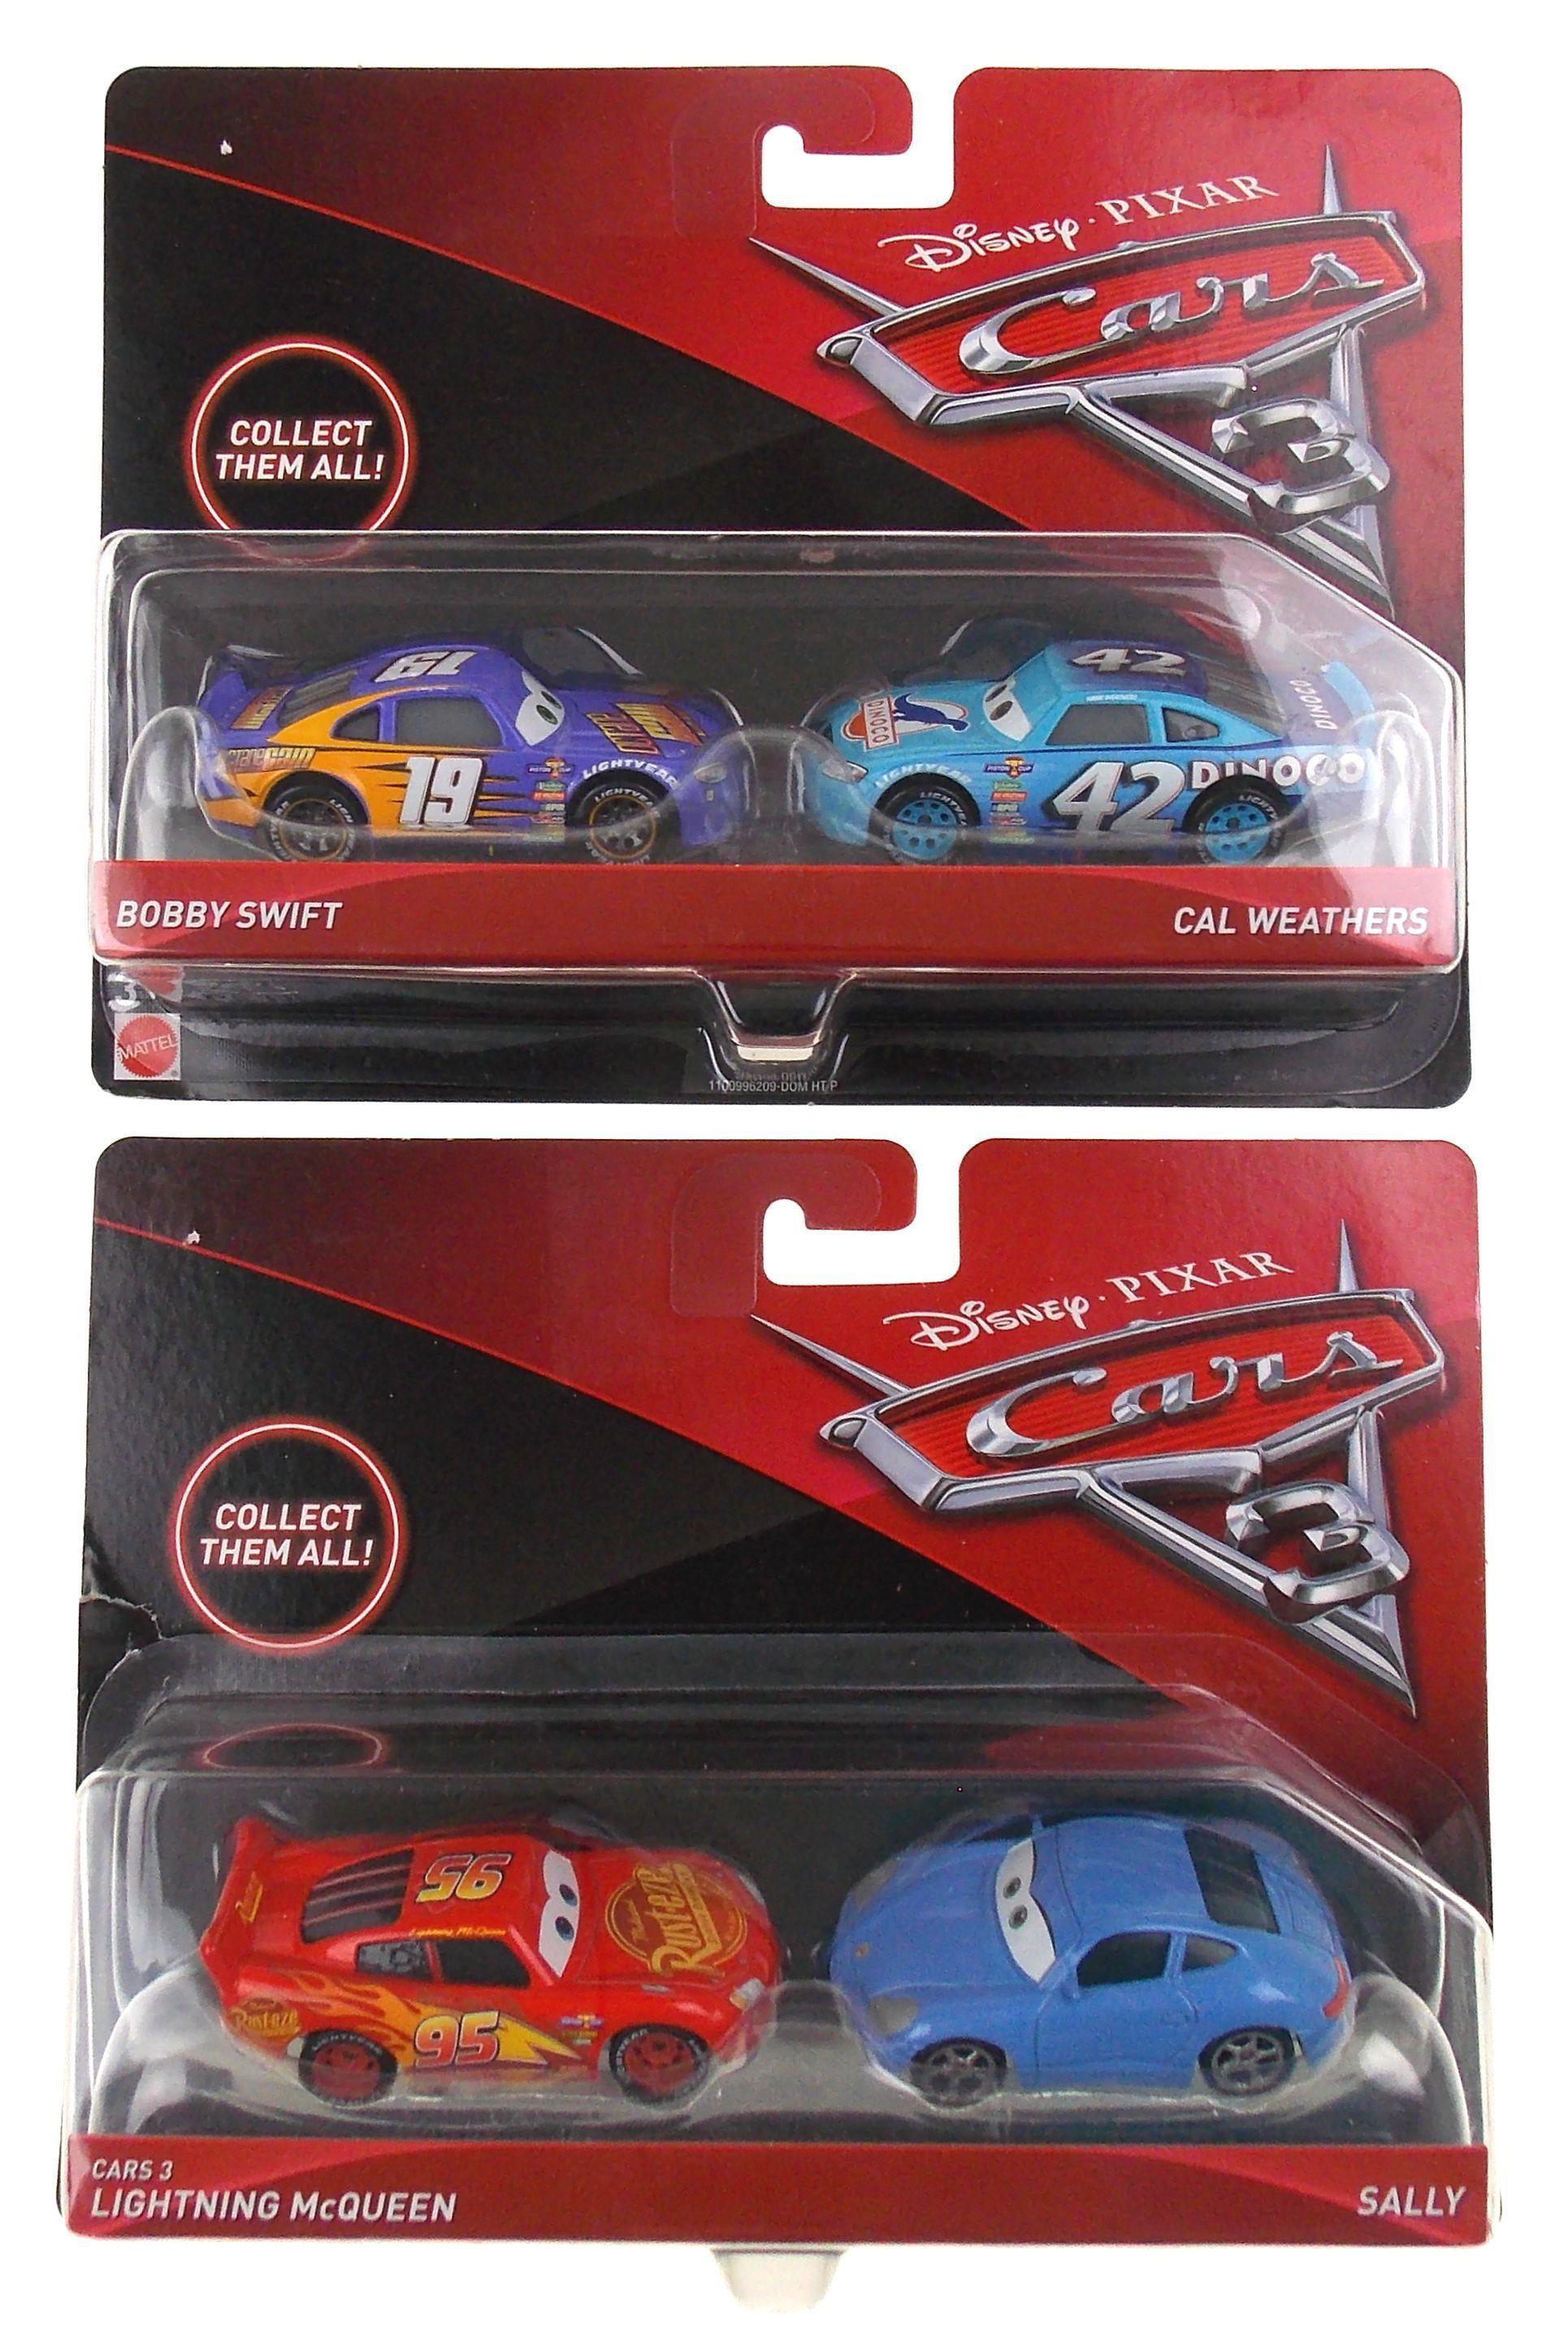 Mattel Disney Pixar Cars 3 Bobby Swift Cal Weathers Lightning Mcqueen Sally Toy Disney Pixar Cars Pixar Cars Lightning Mcqueen